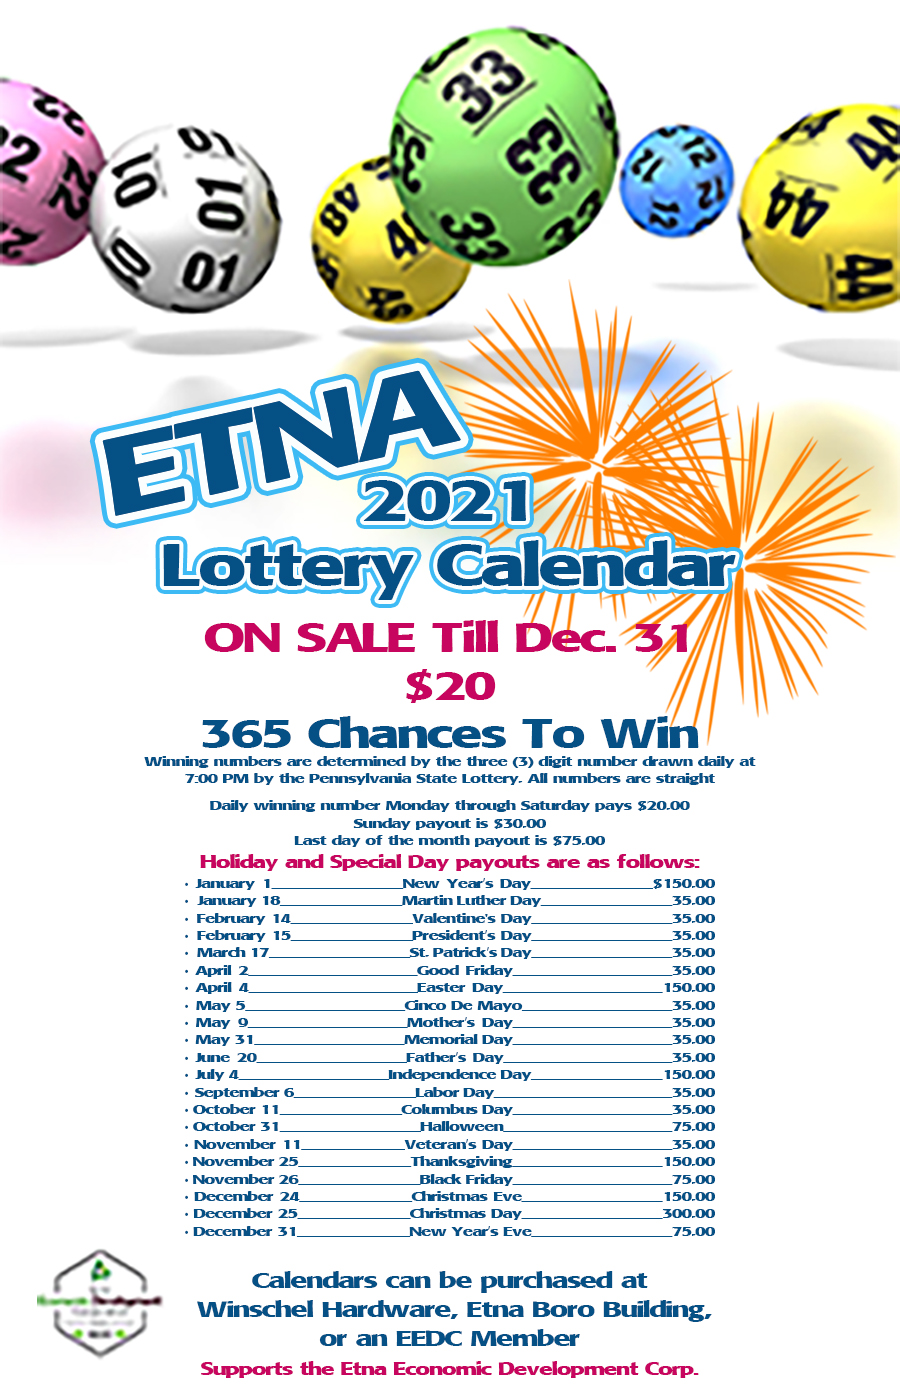 EEDC Lottery Calendars On Sale Now